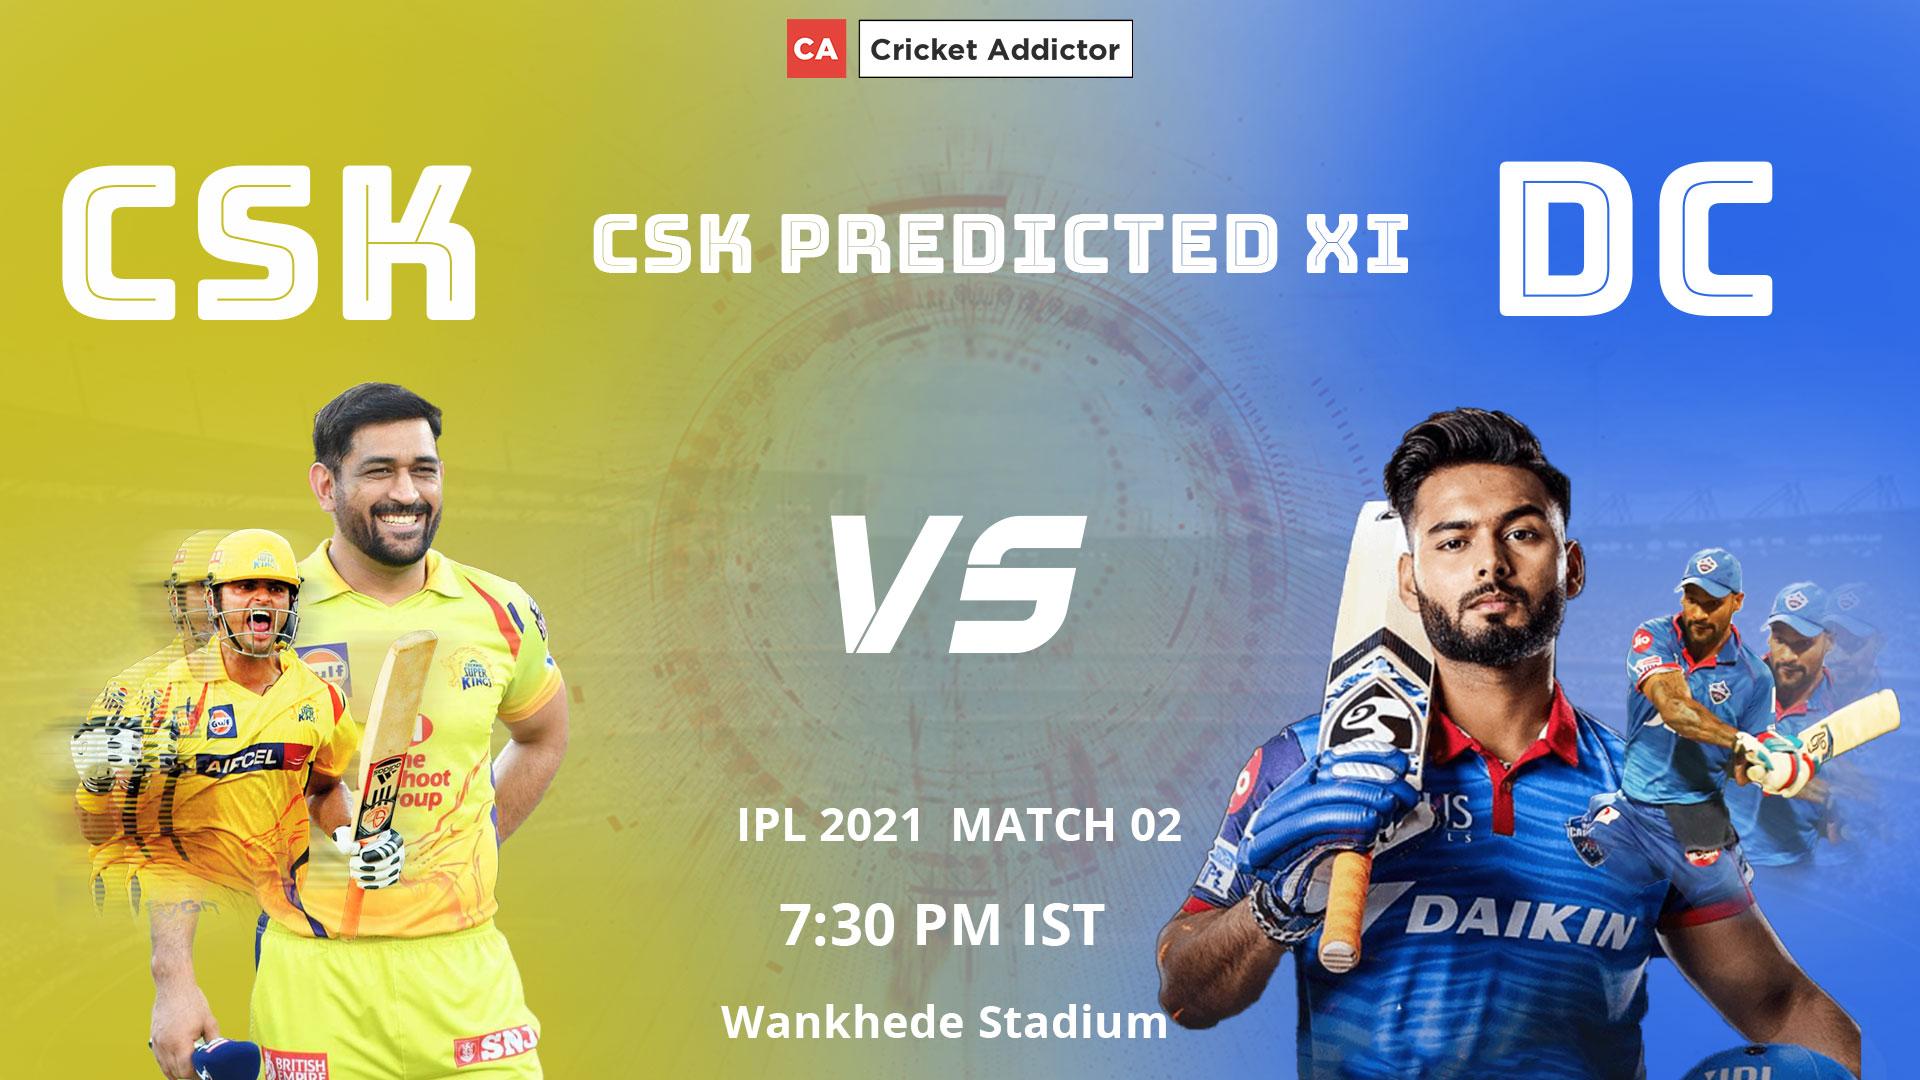 Chennai Super Kings, CSK, predicted XI